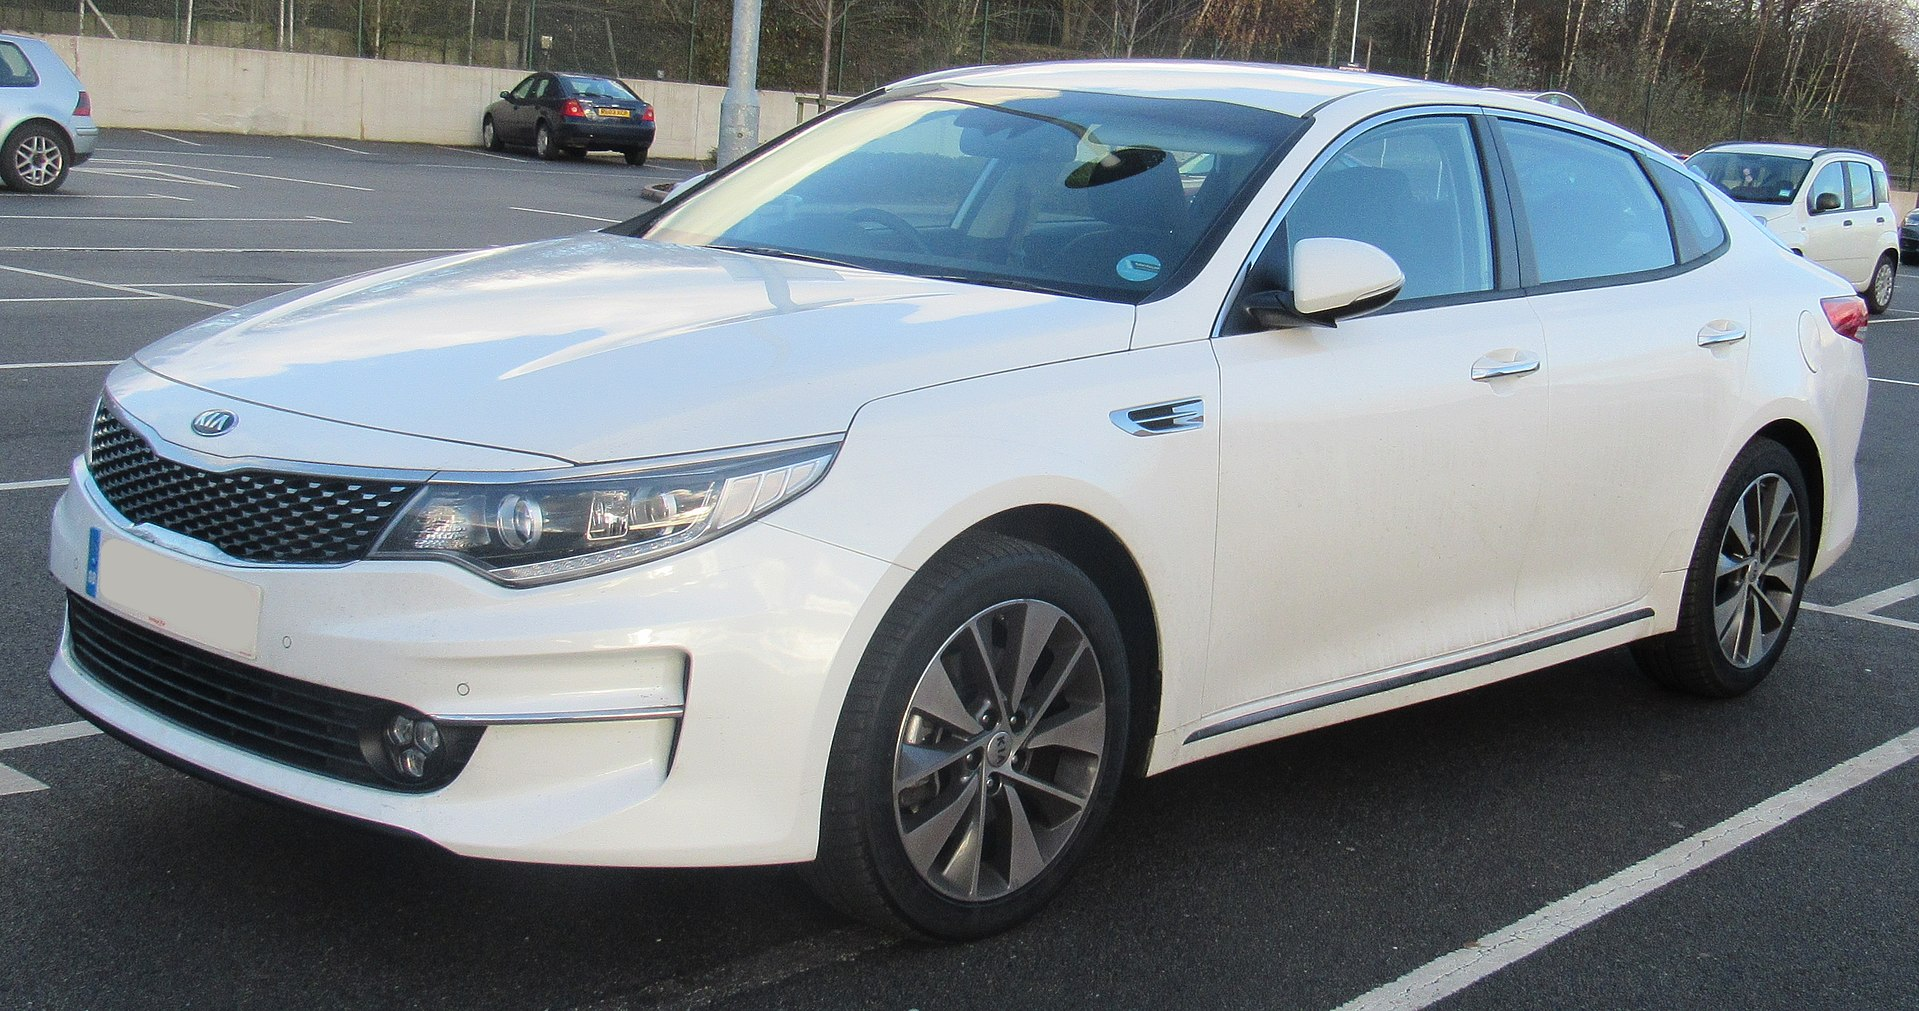 4. Kia Optima Hybrid